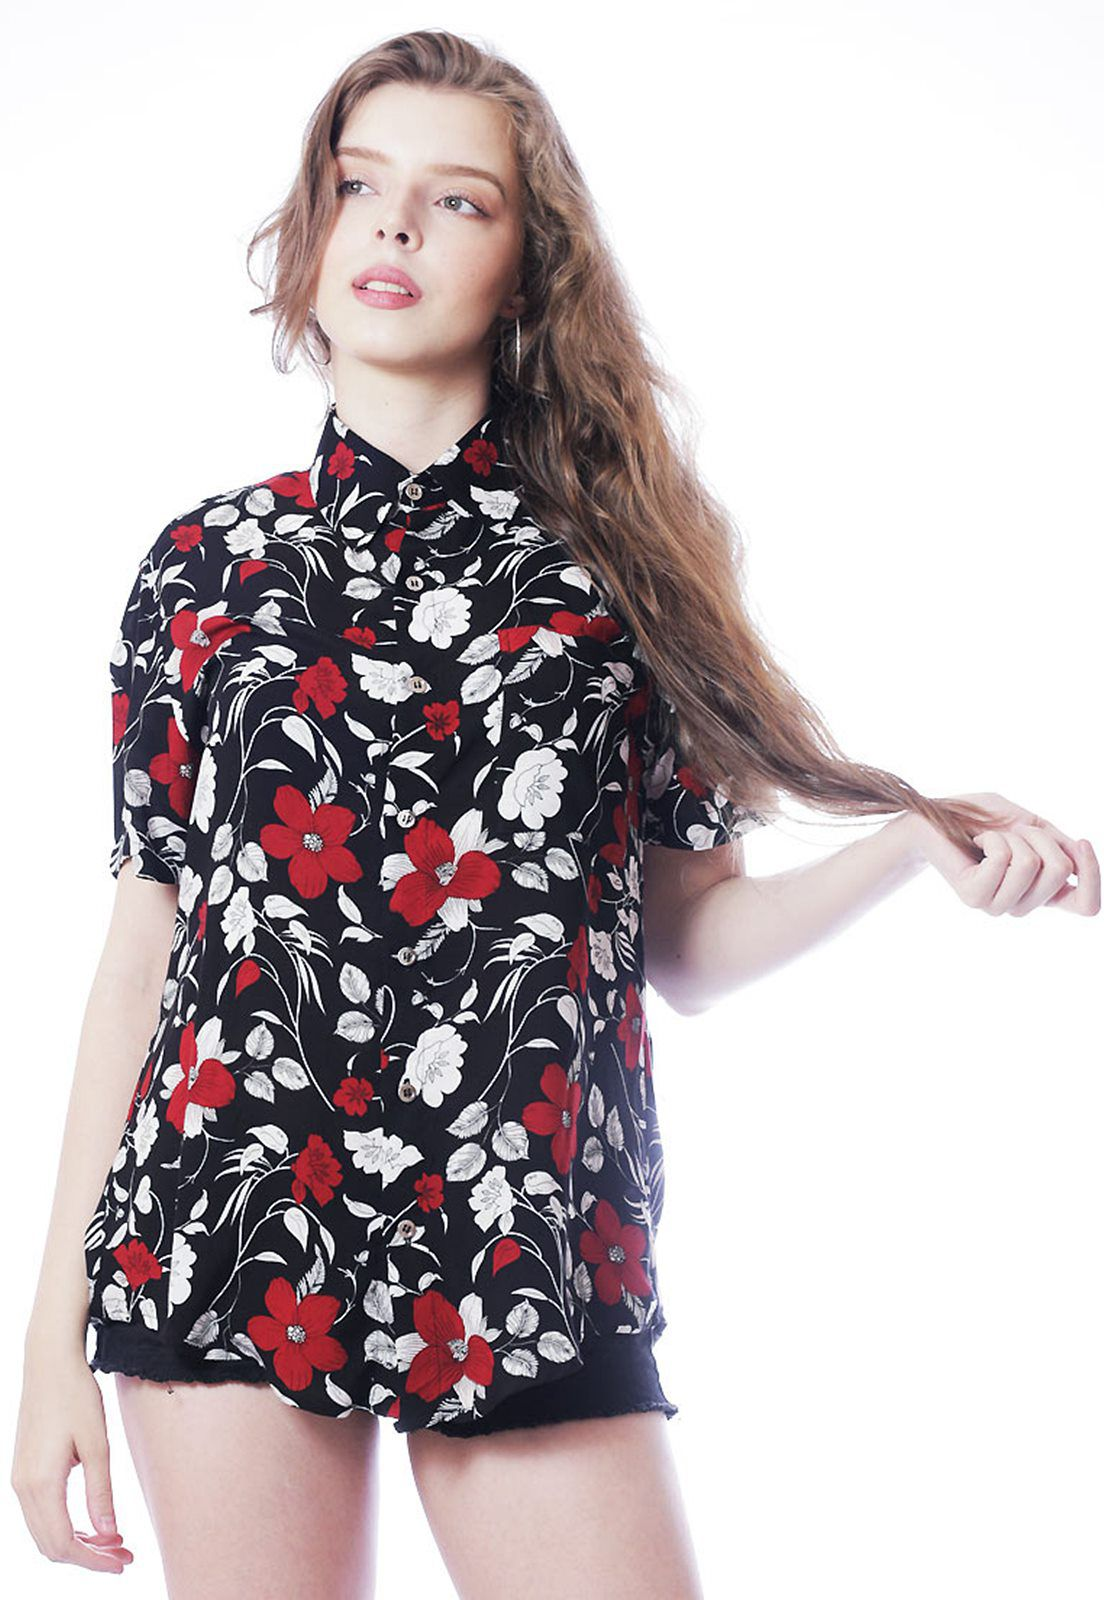 Camisa Floral Estampada ElephunK Unissex Dark Flowers Preta